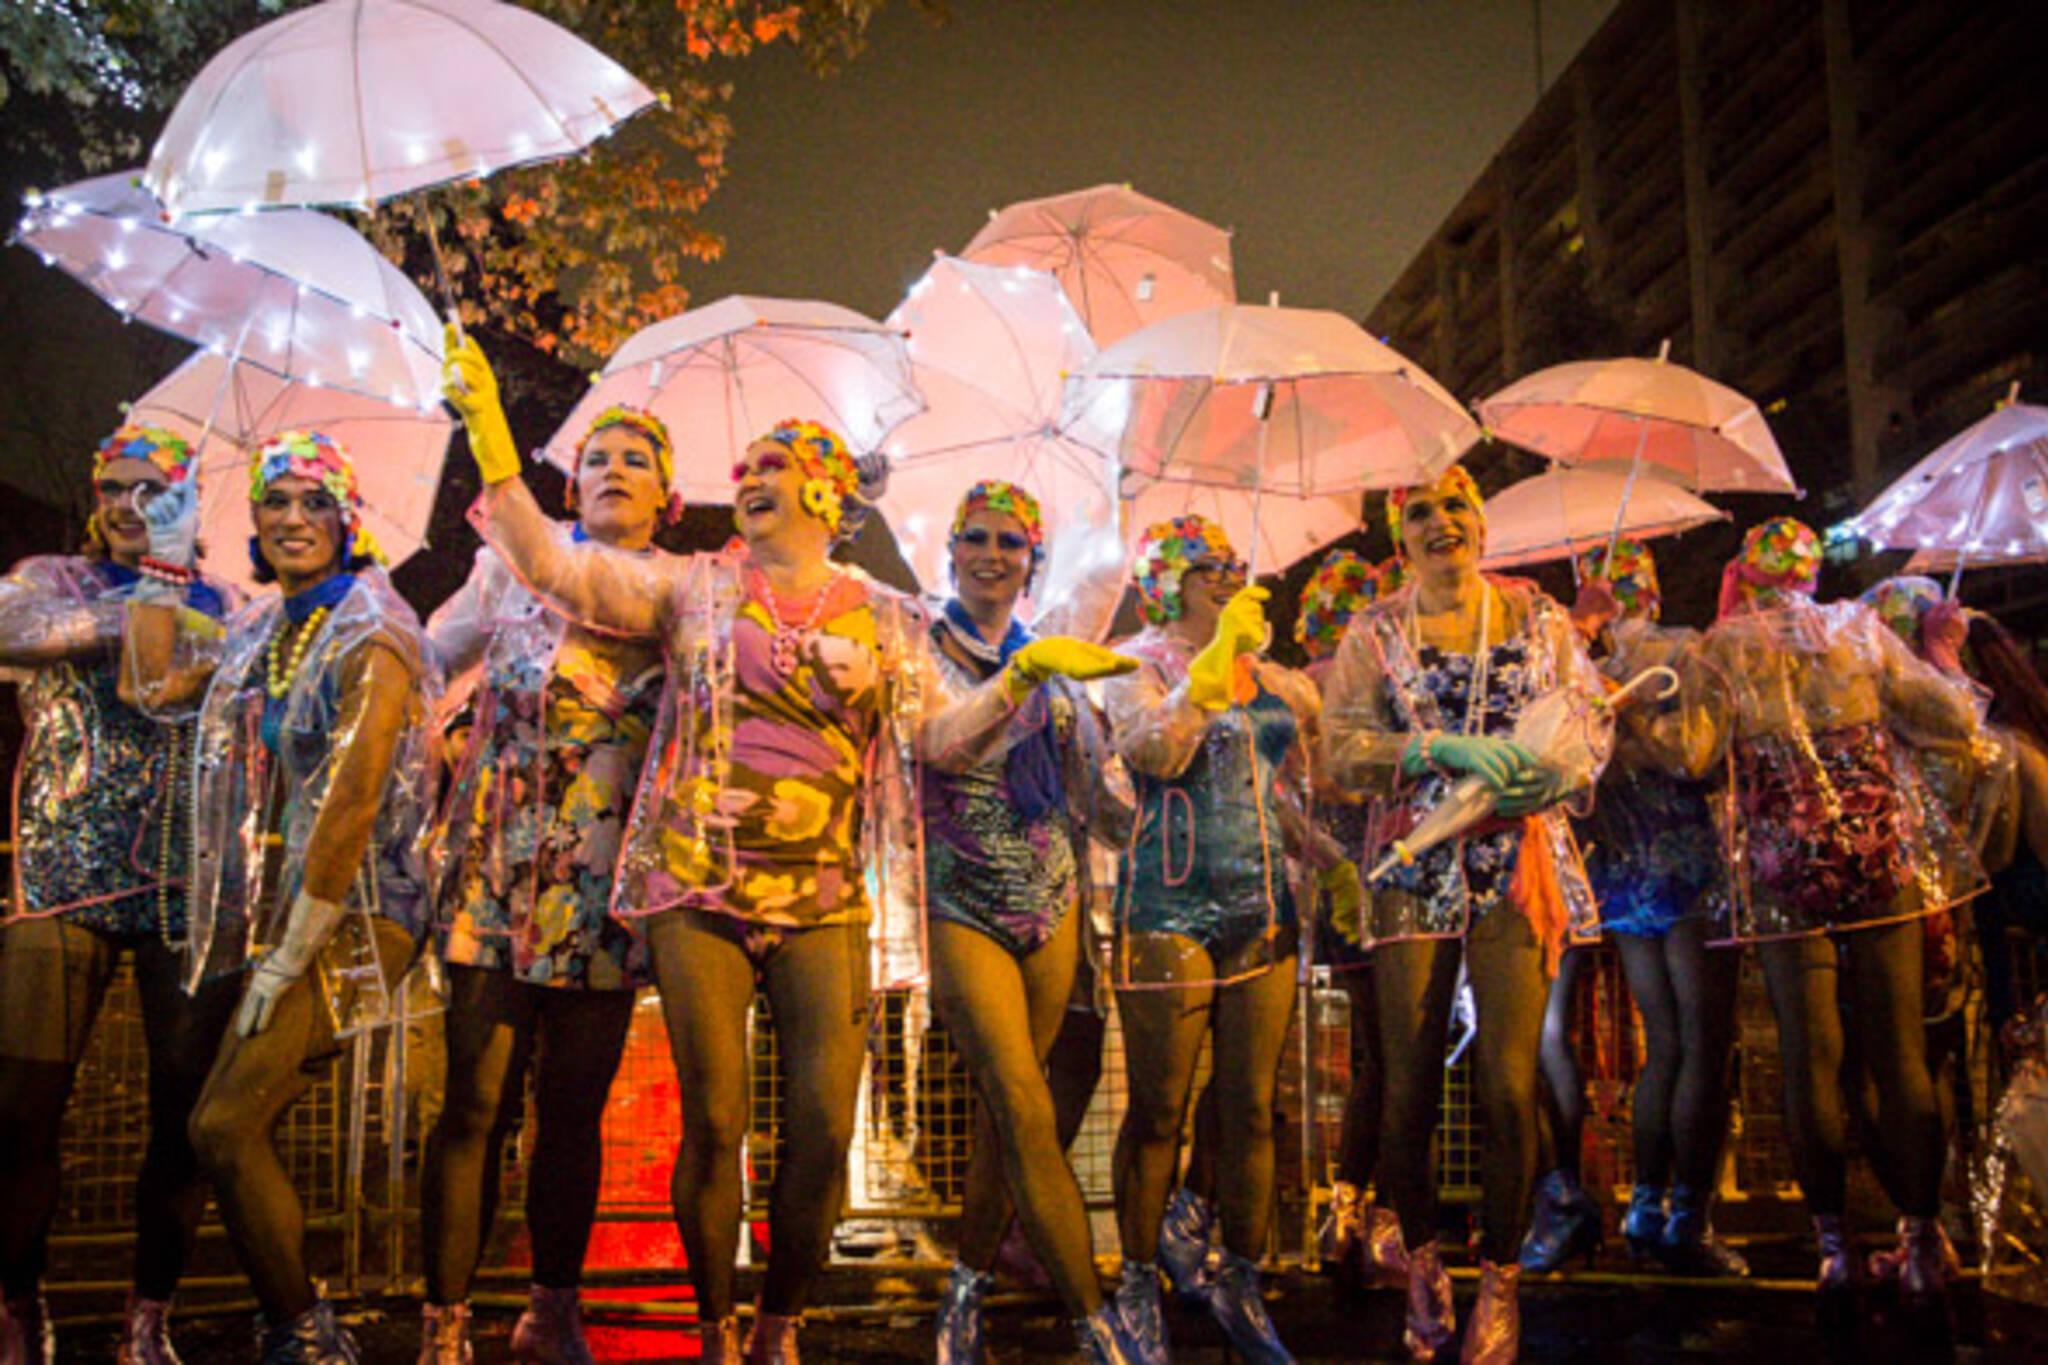 Church Street Halloween Party